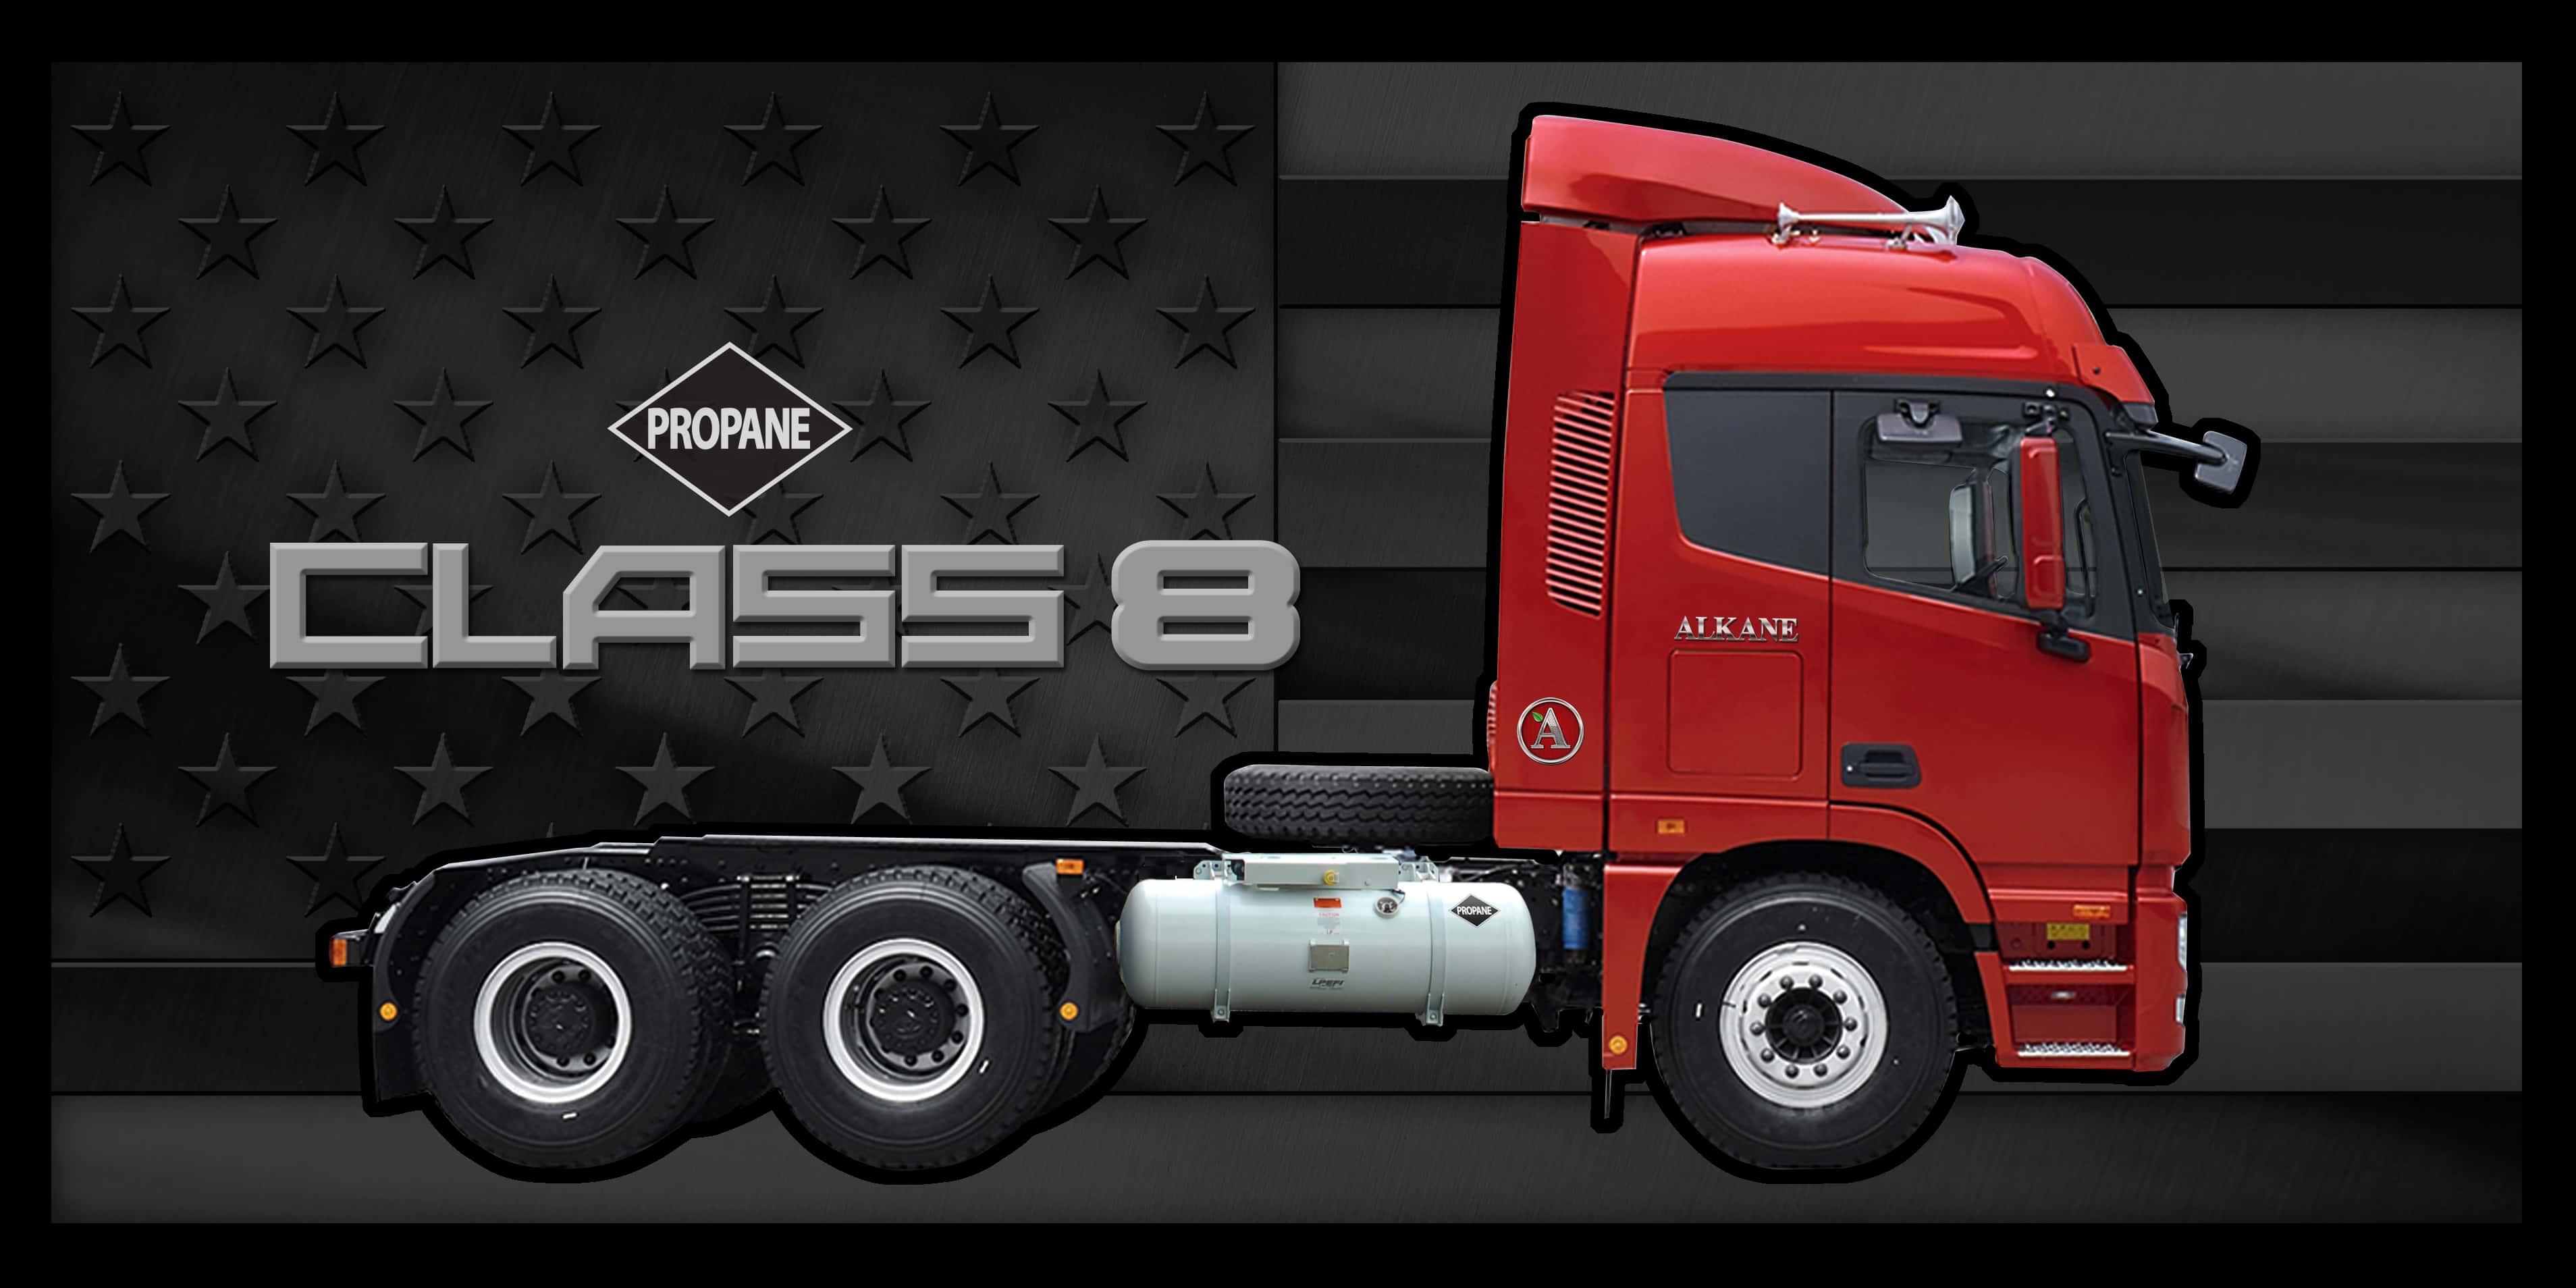 Long Haul Trucking >> Alkane Truck Announces Propane Autogas Class 8 Cab-Over - NGT News